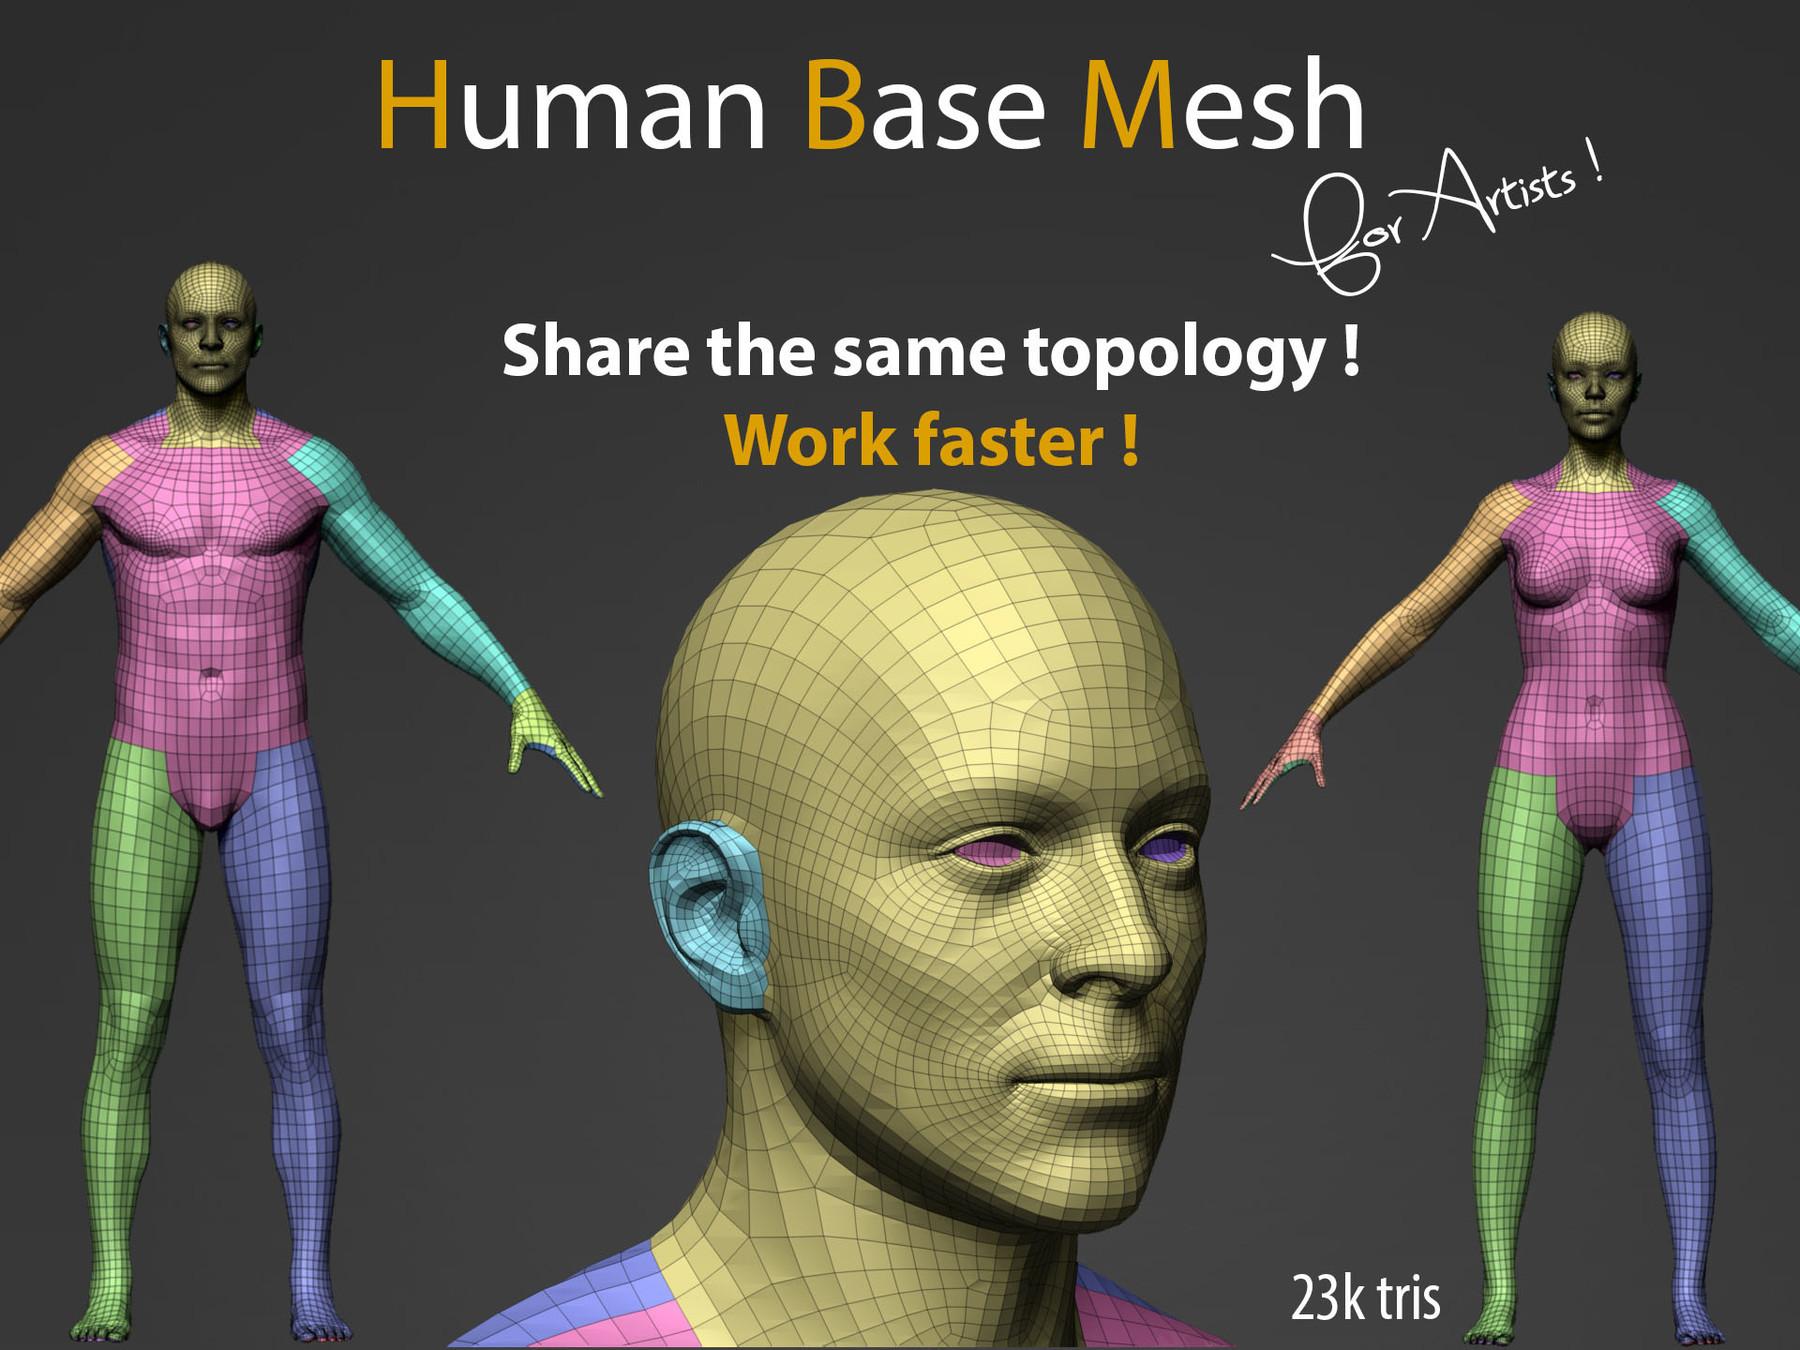 Pascal ackermann human bm img1